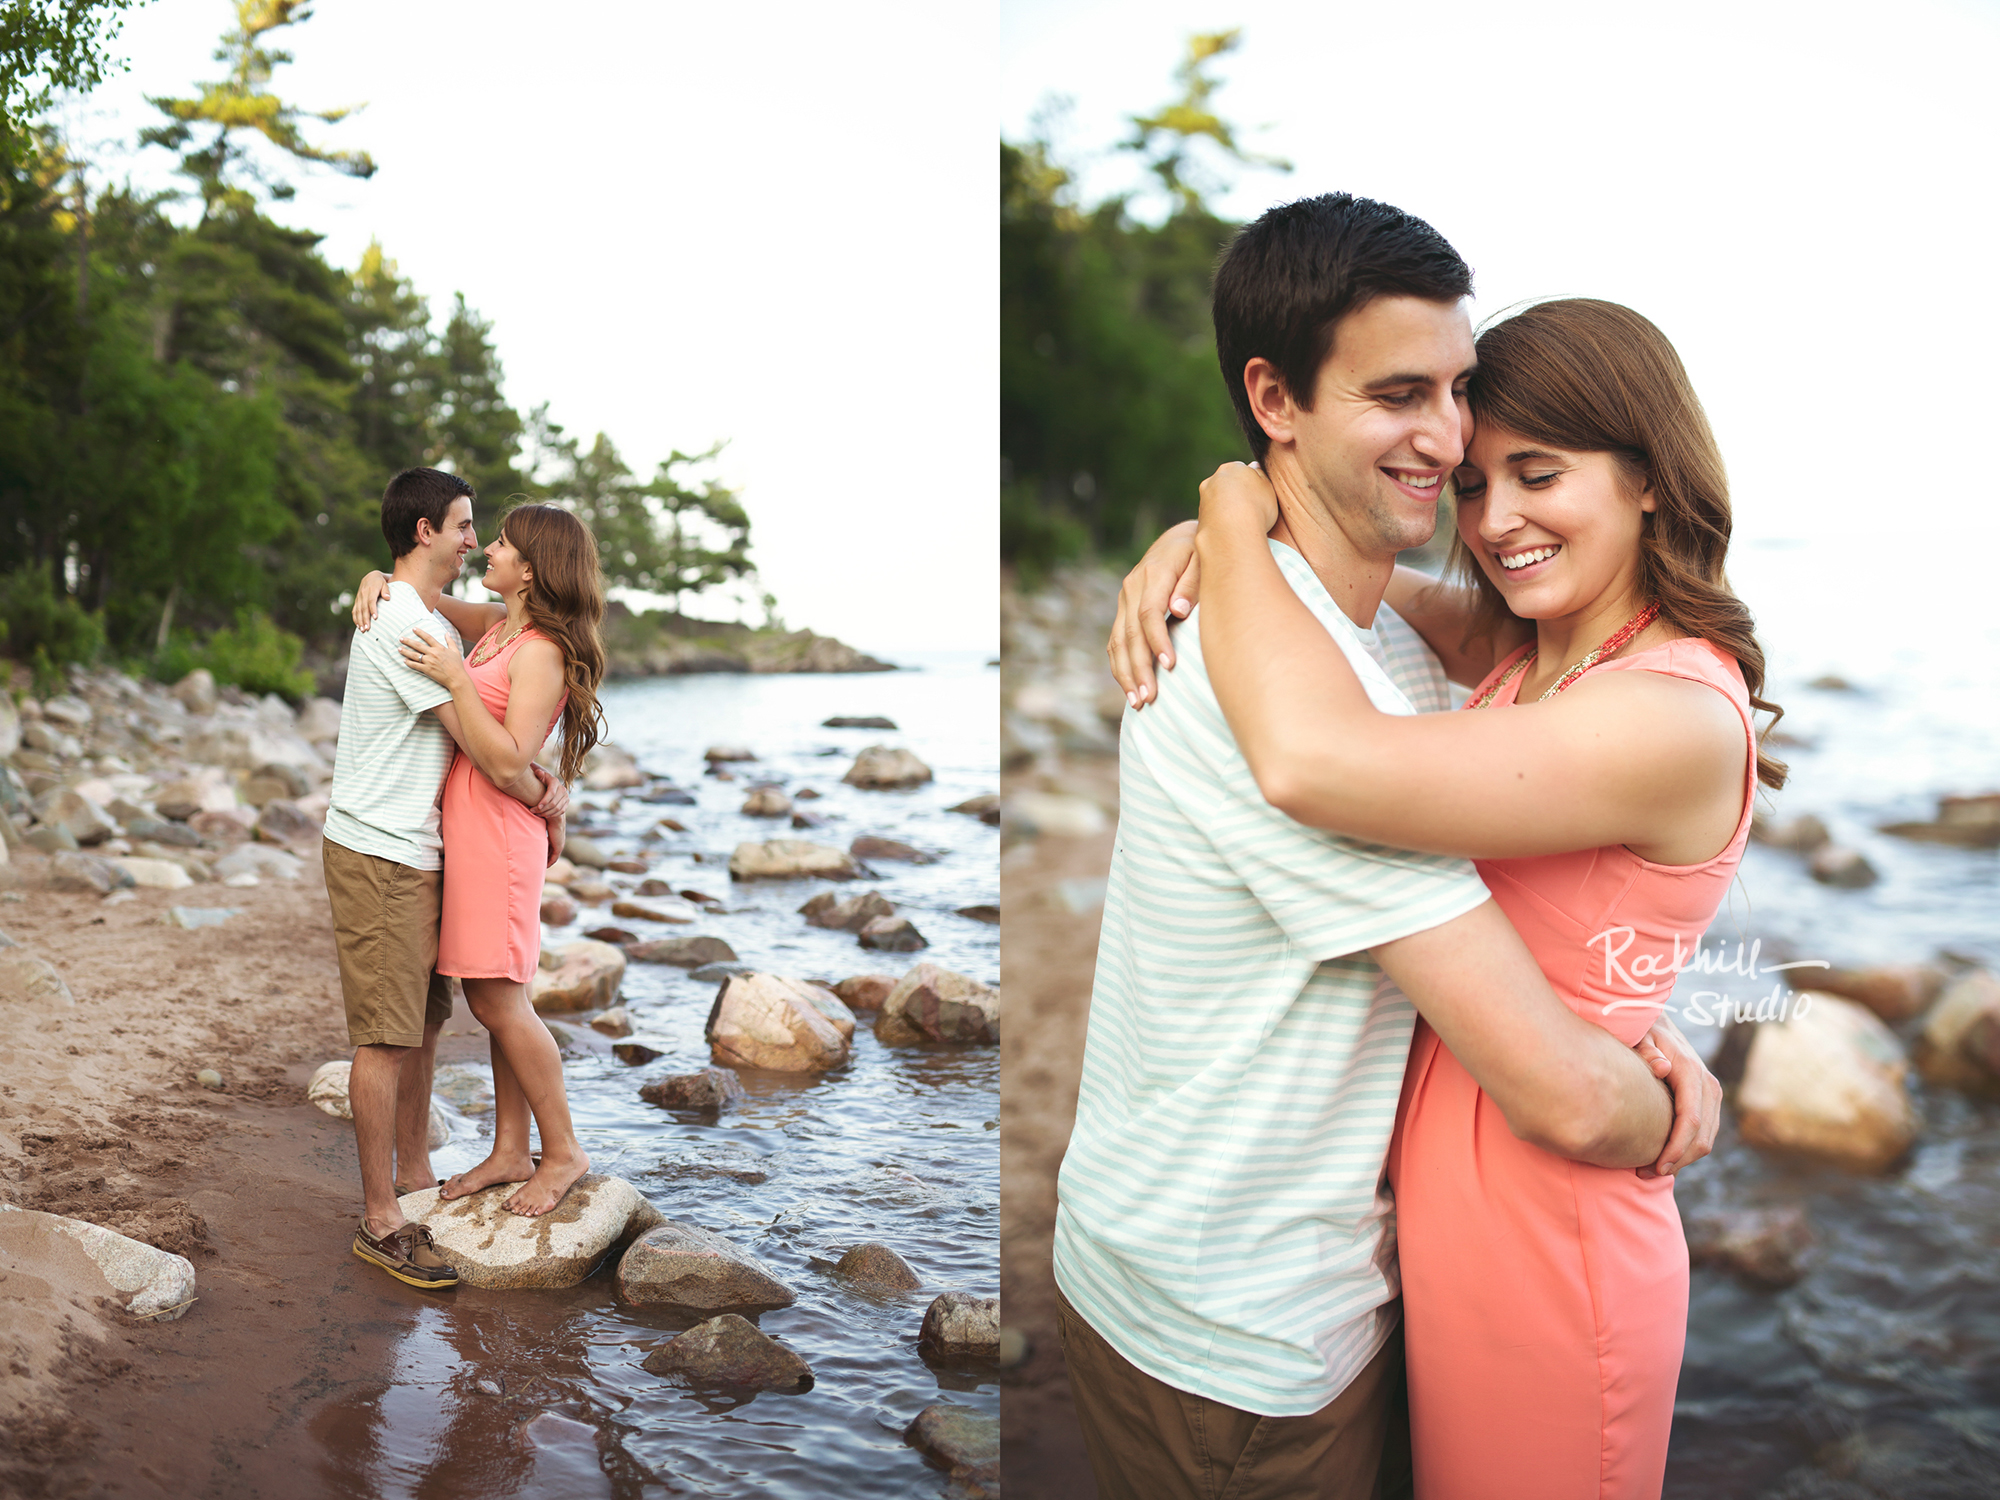 rockhill-studio-marquette-michigan-upper-peninsula-engagement-photographer-wetmore-landing-lake-superior-wedding-26.jpg